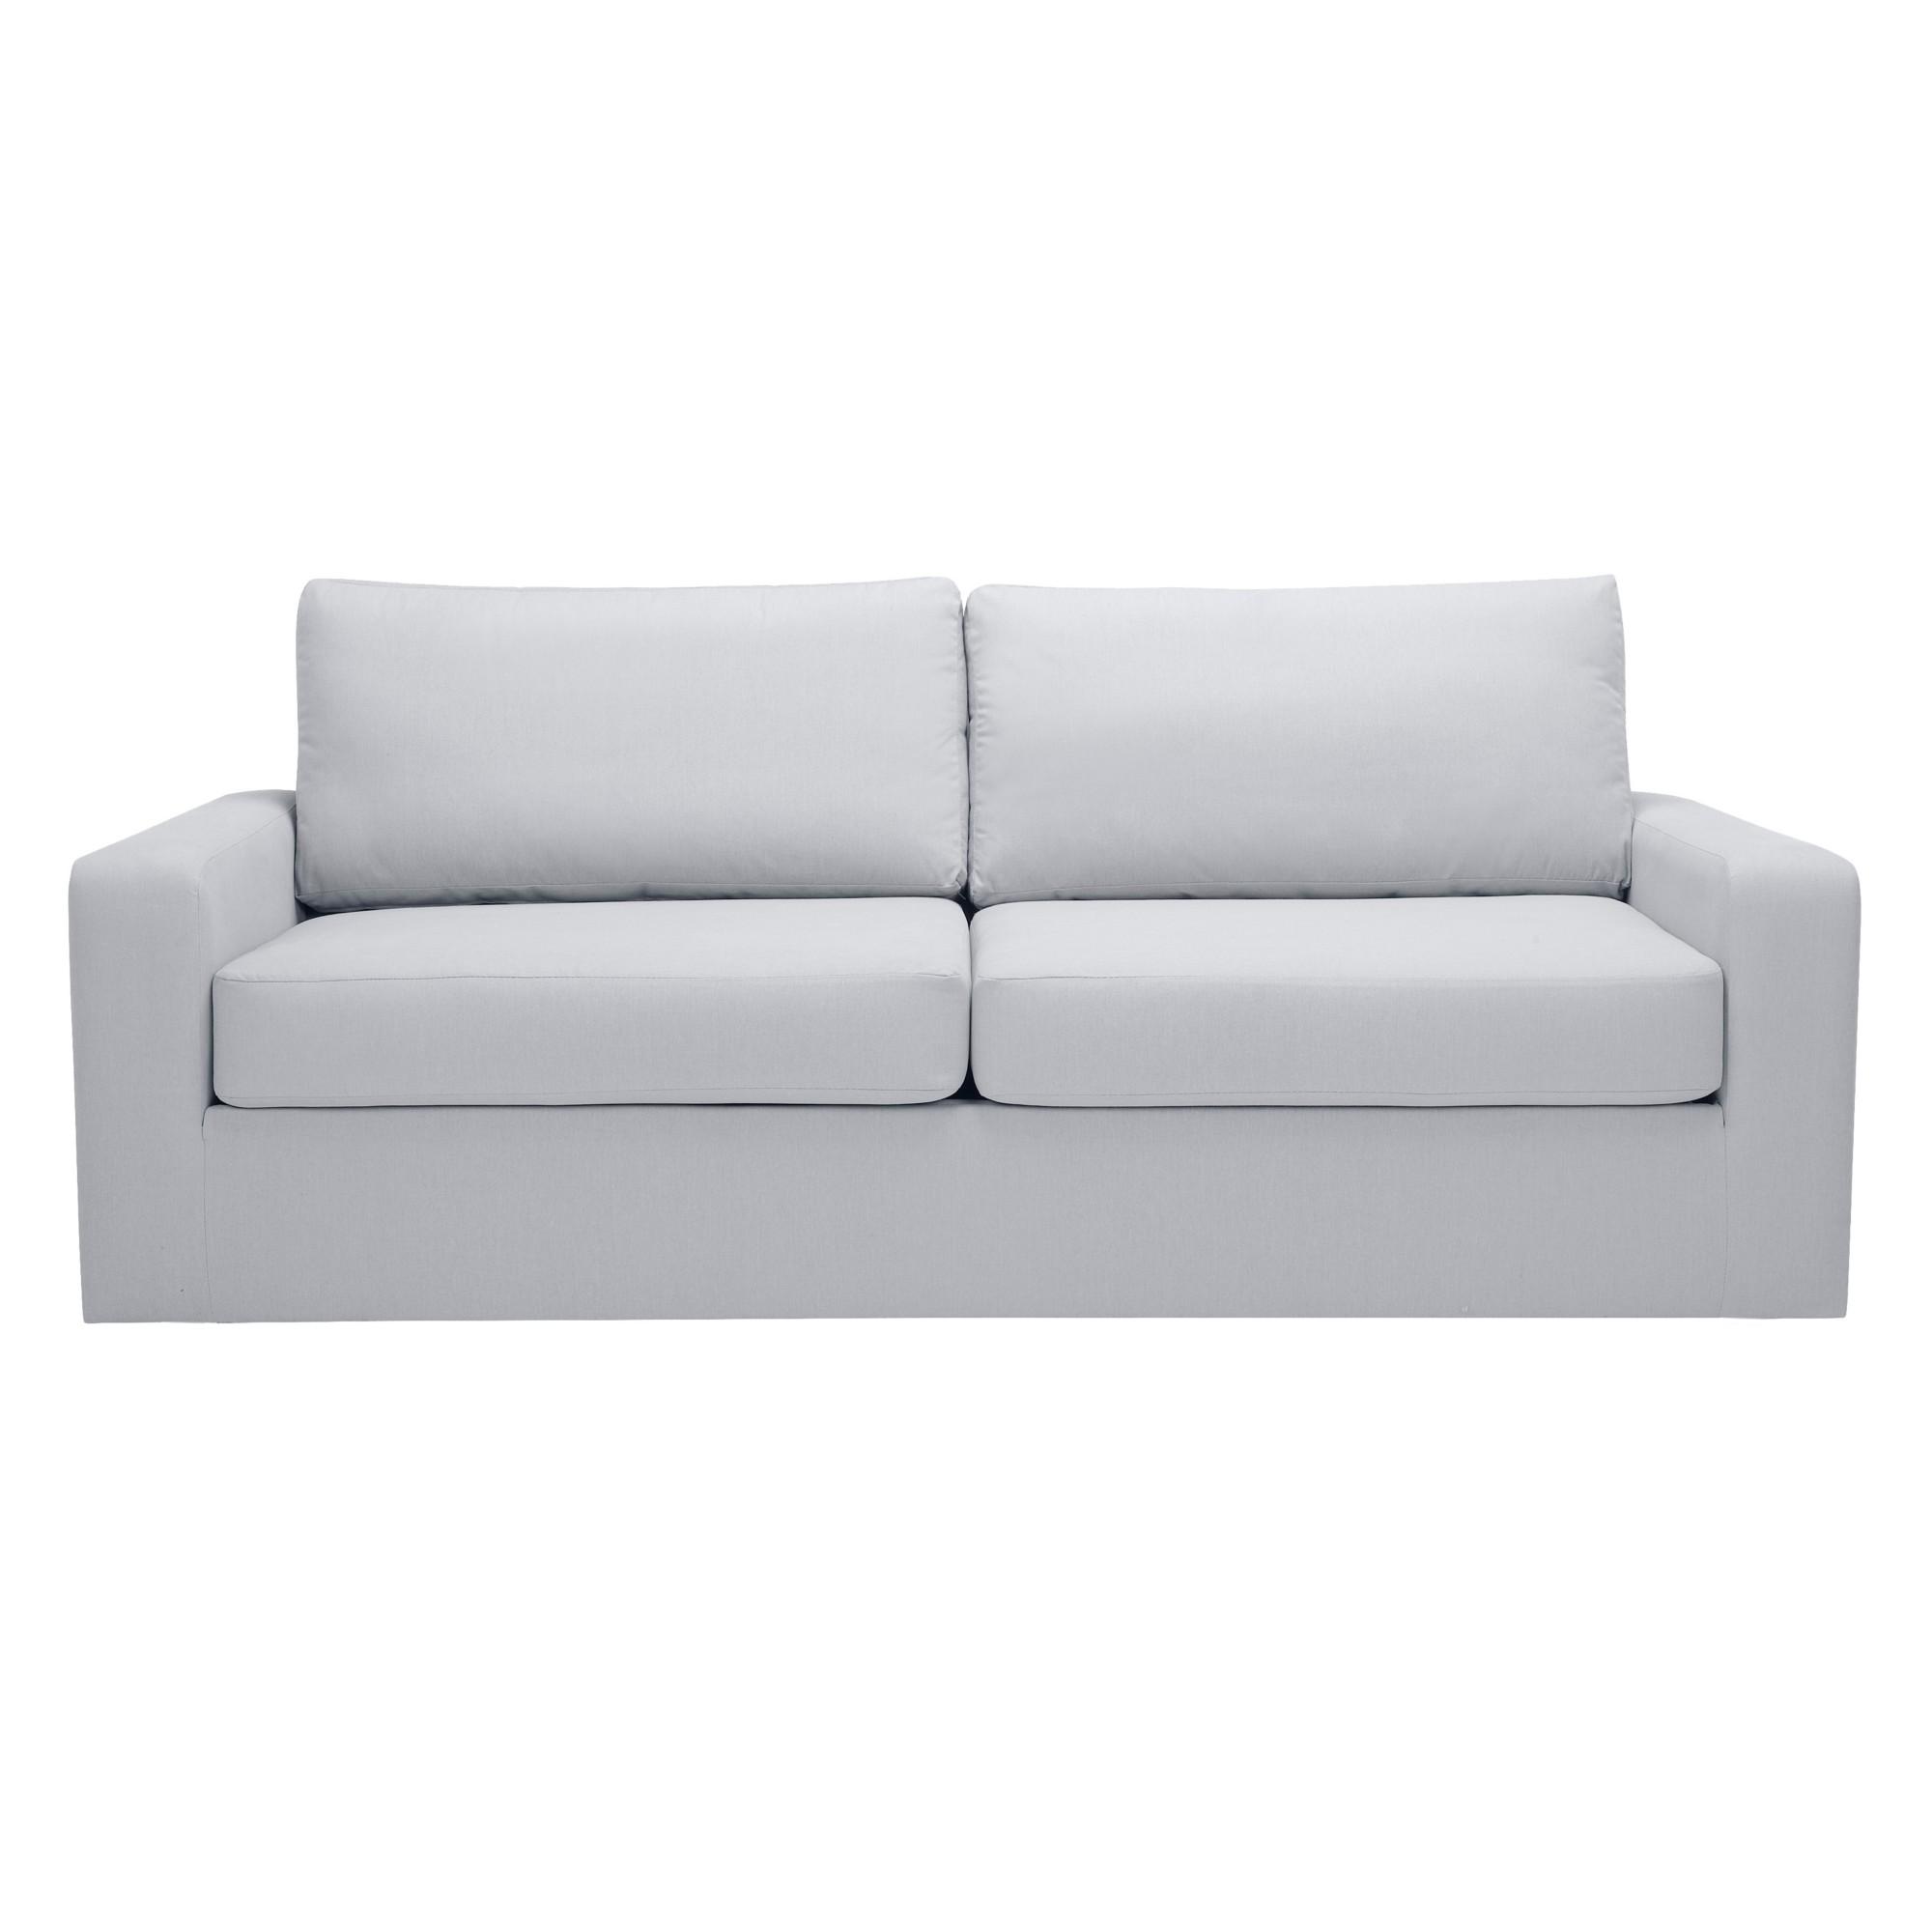 John Lewis Cubic Pocket Sprung Grand Sofa Bed